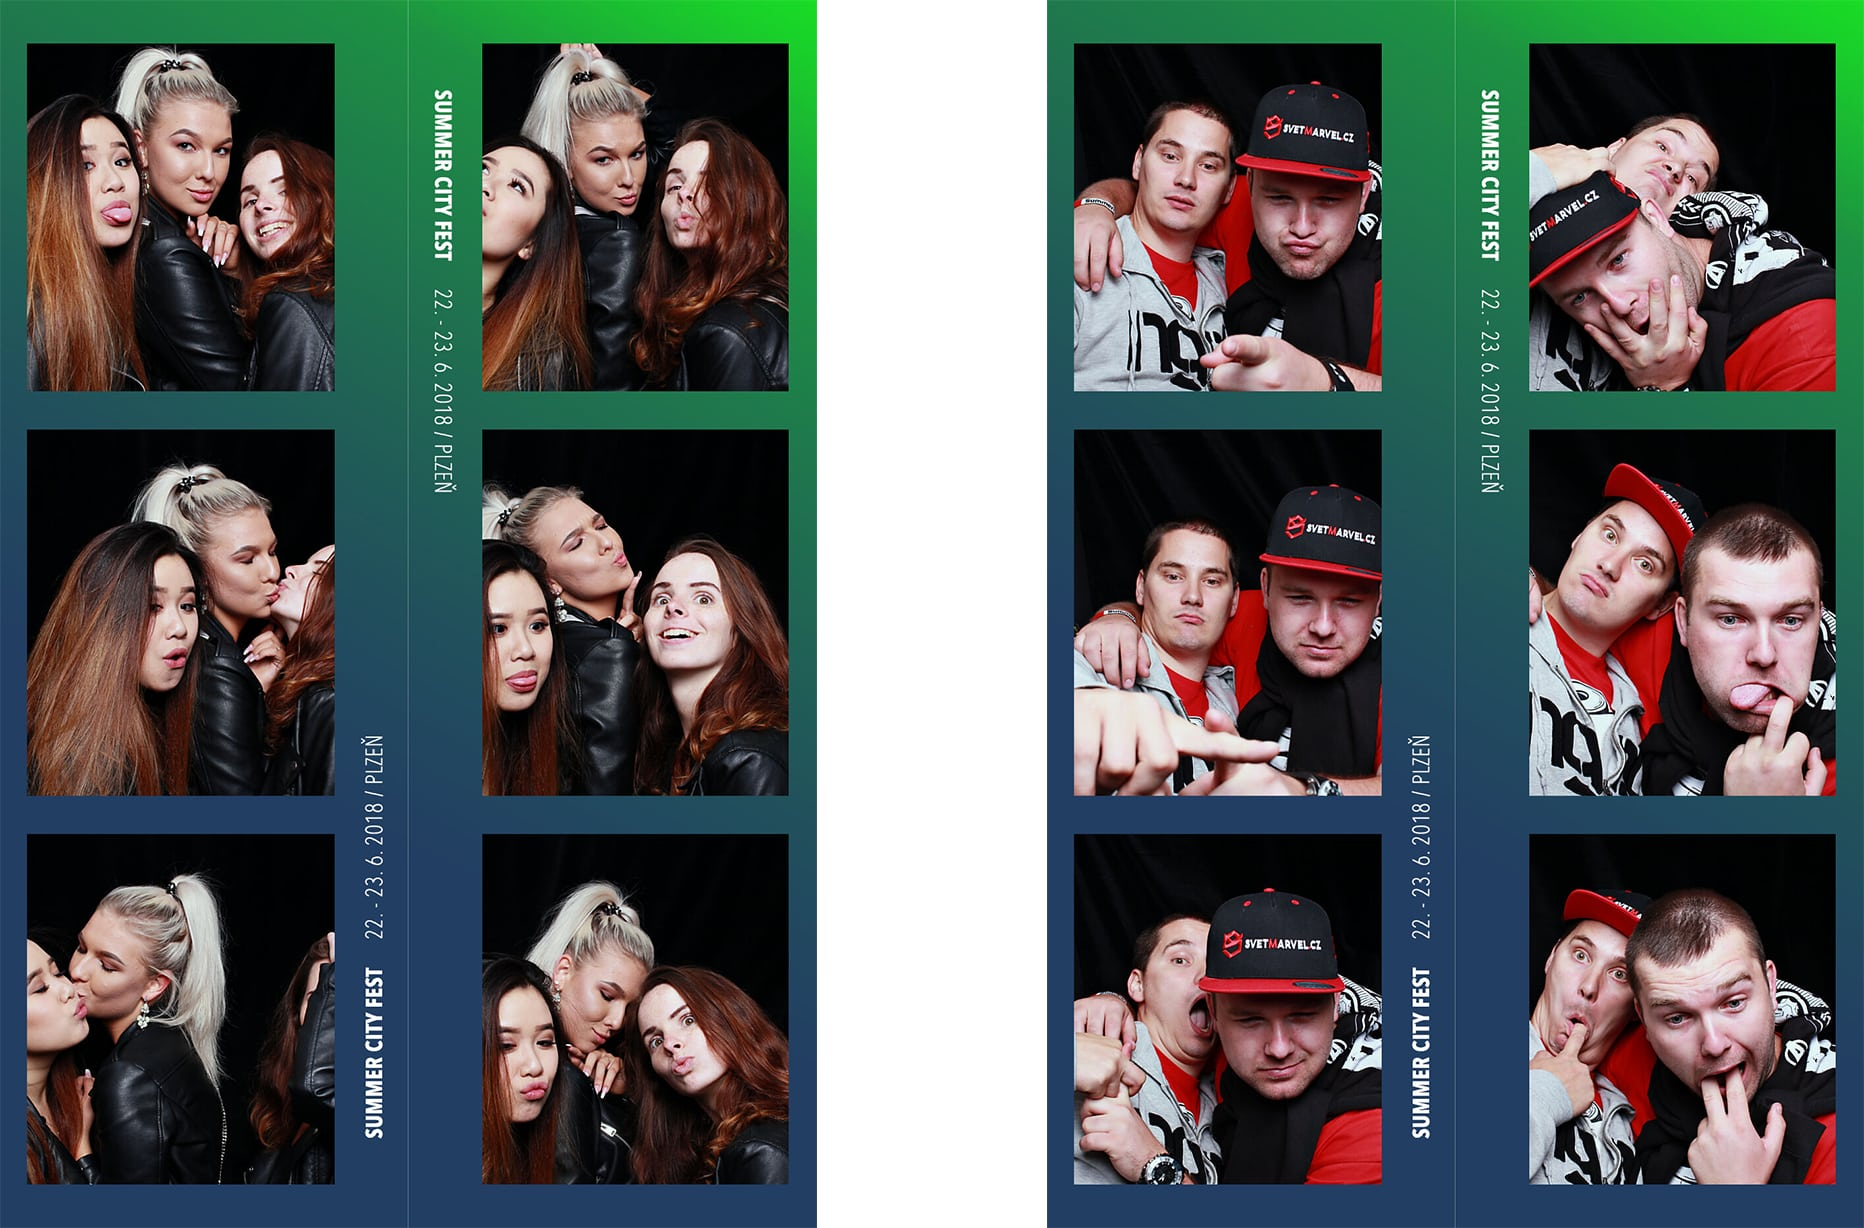 fotokoutek-coolhunters-bolevak-23-6-2018-443513